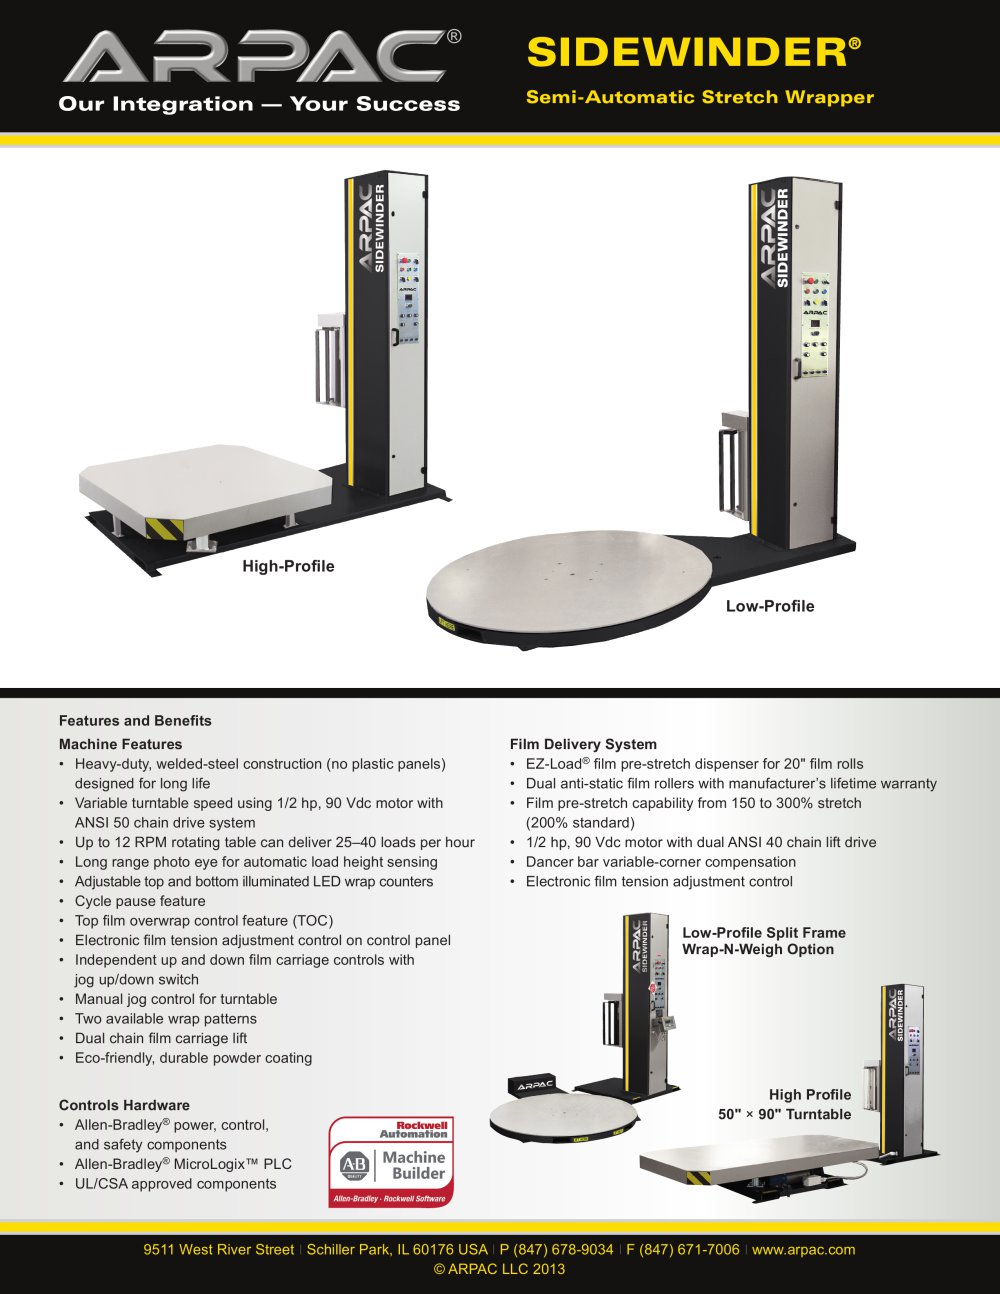 Sidewinder Semi-Automatic Stretch Wrapper - ARPAC Group - PDF ...